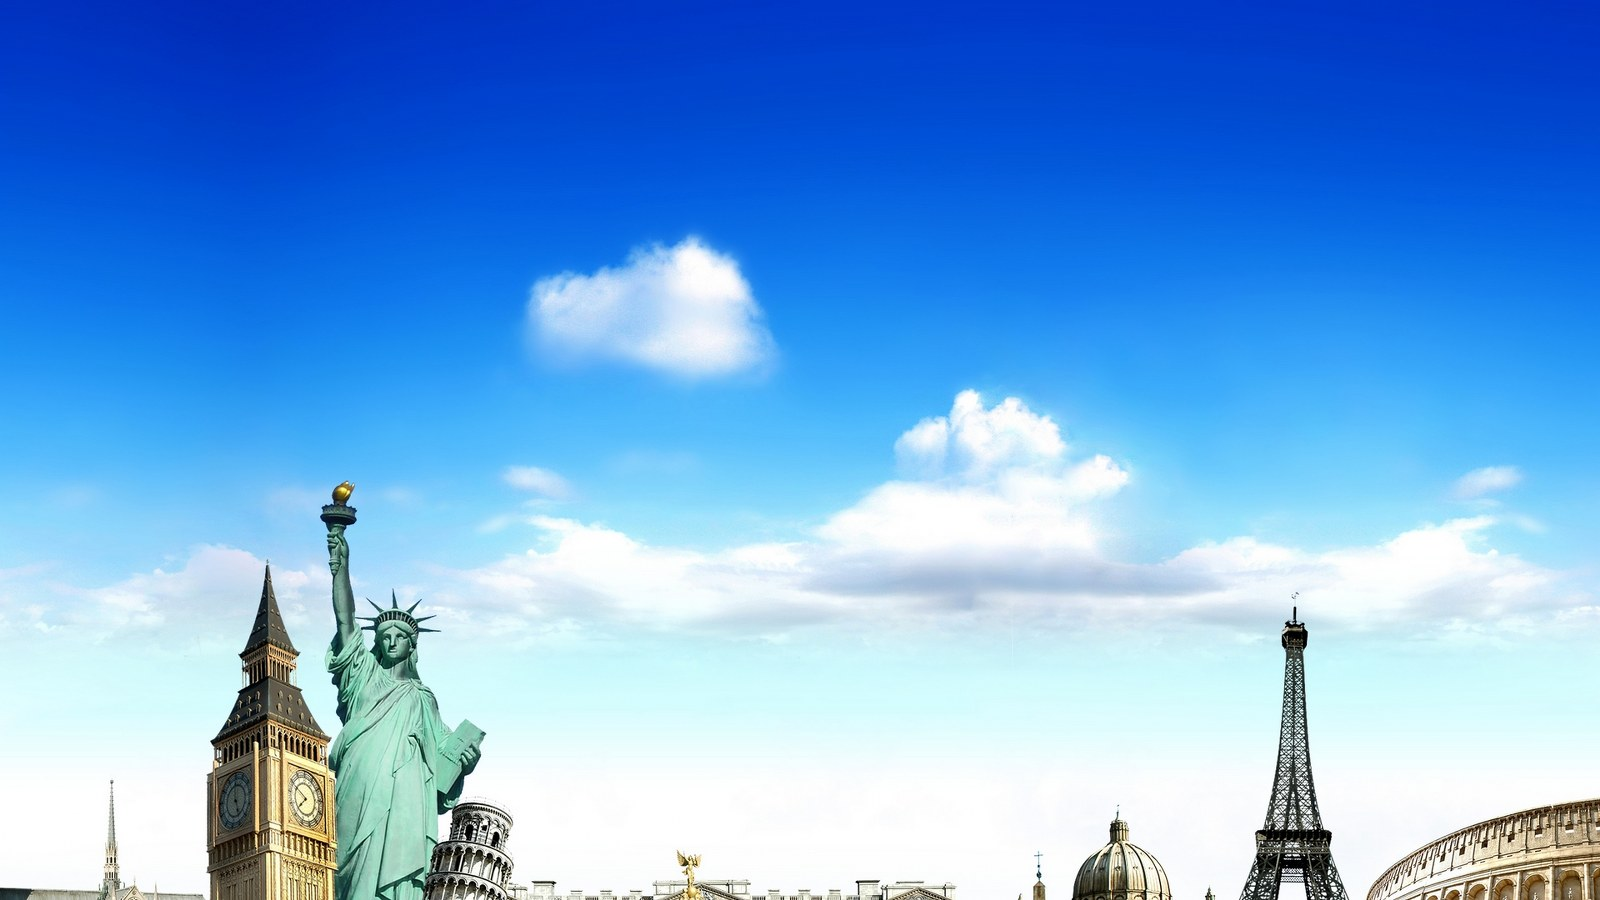 Ipad Backgrounds Travel - 1600x900 ...